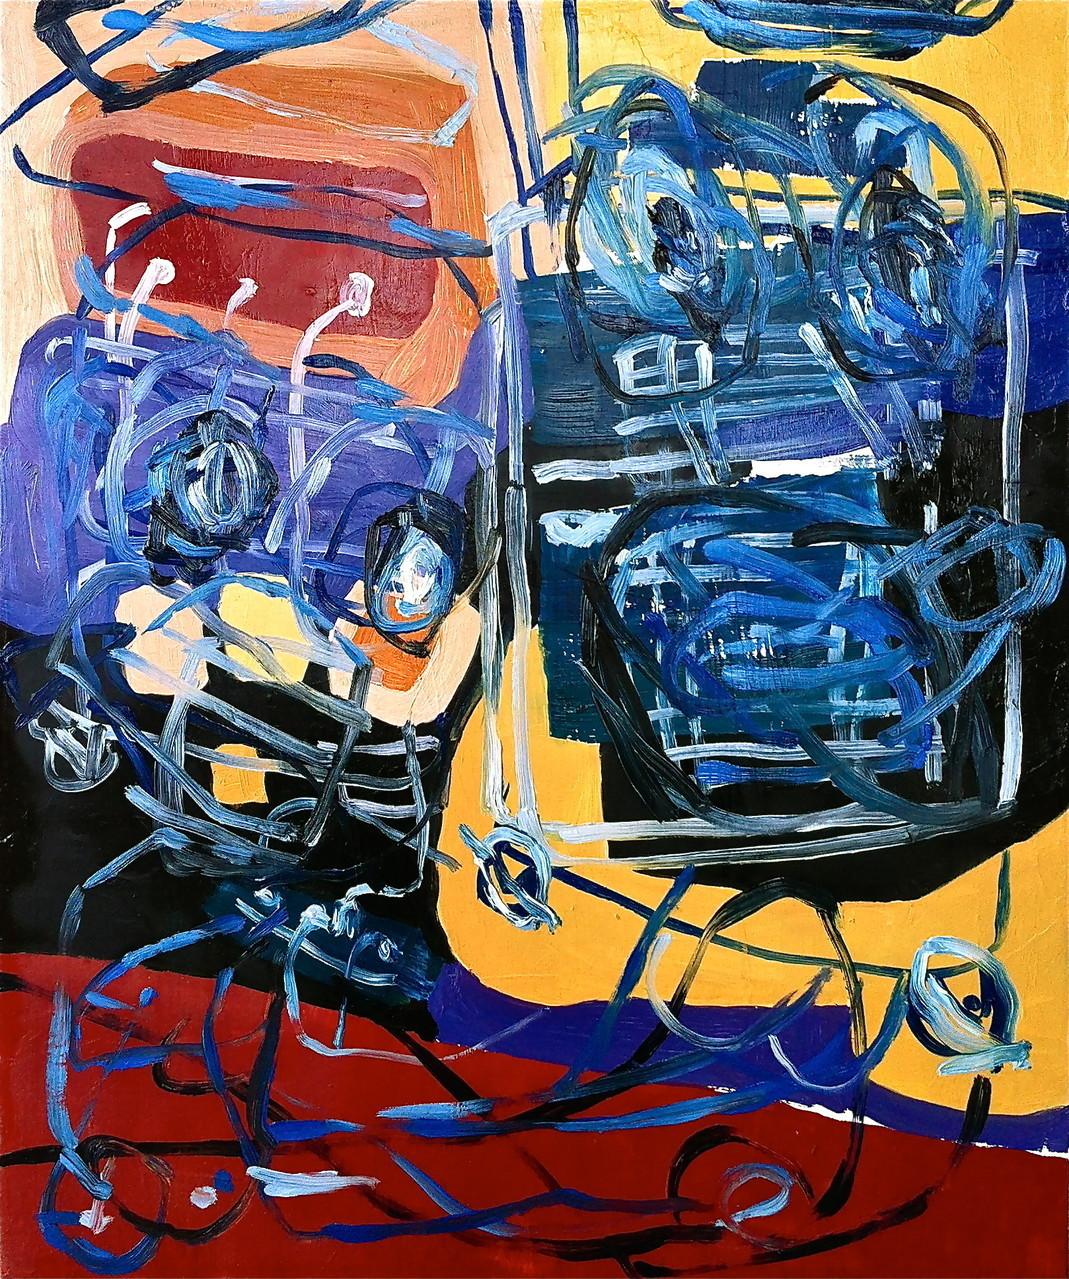 Cavetti collegamenti ipertestuali, olio su tela cm 46x55, 2014